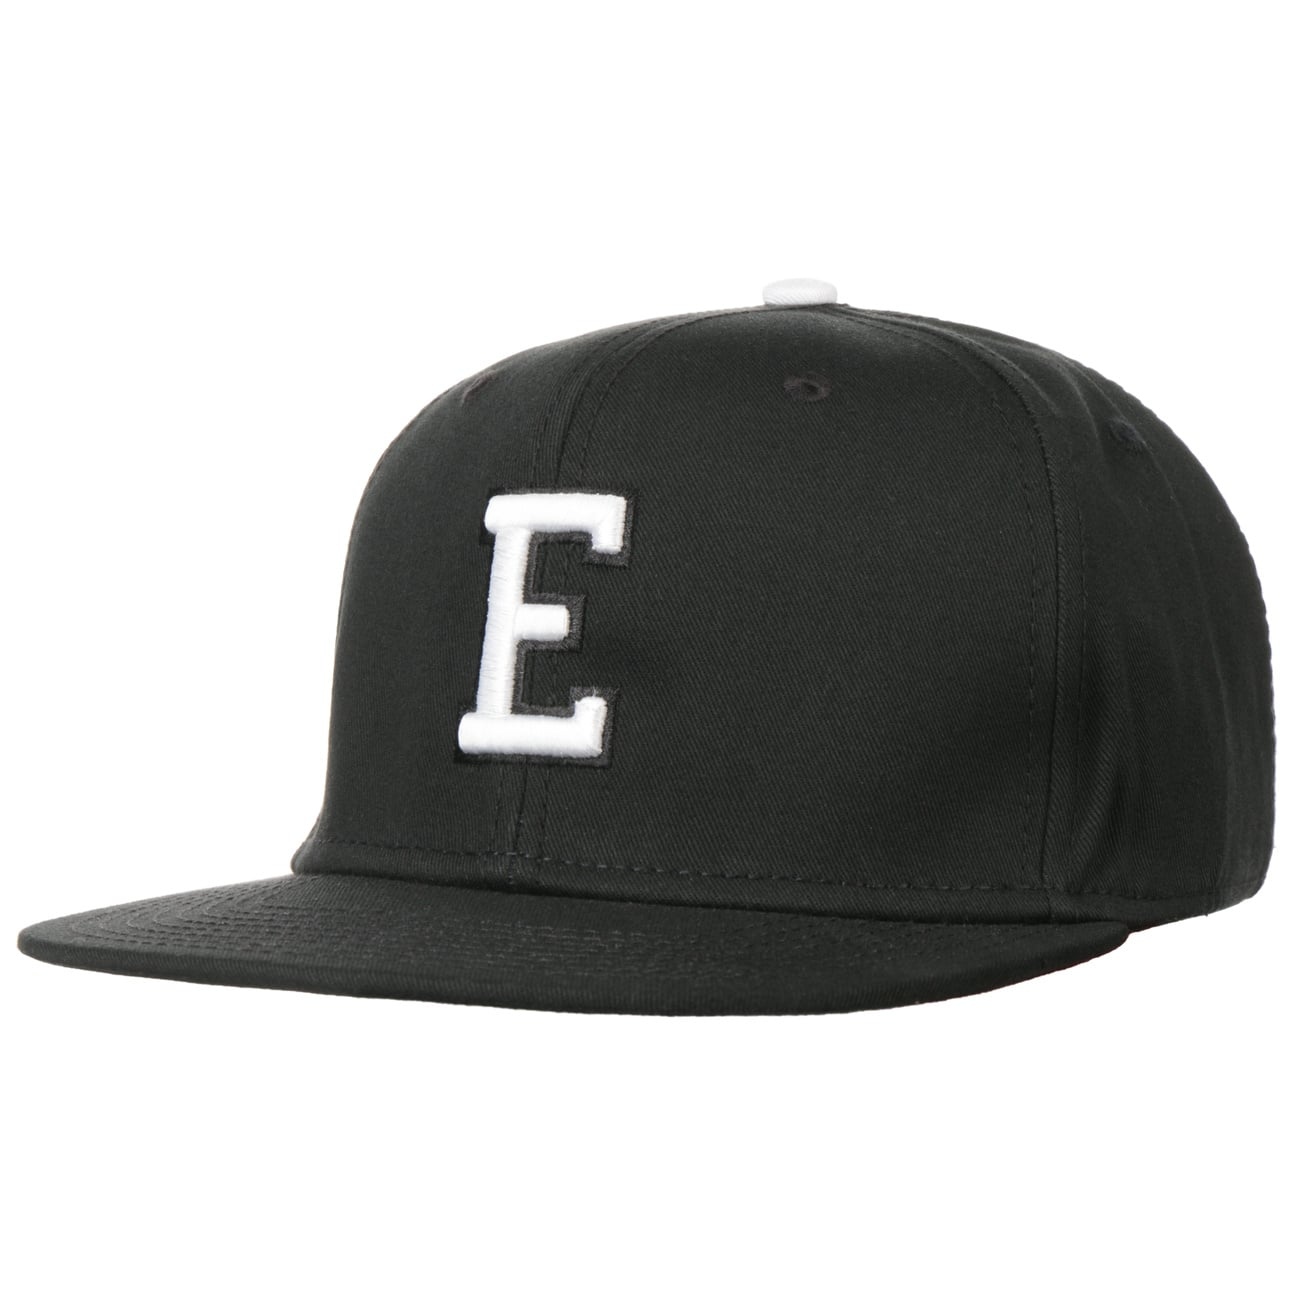 Casquette E Letter Snapback Cap  casquette de baseball